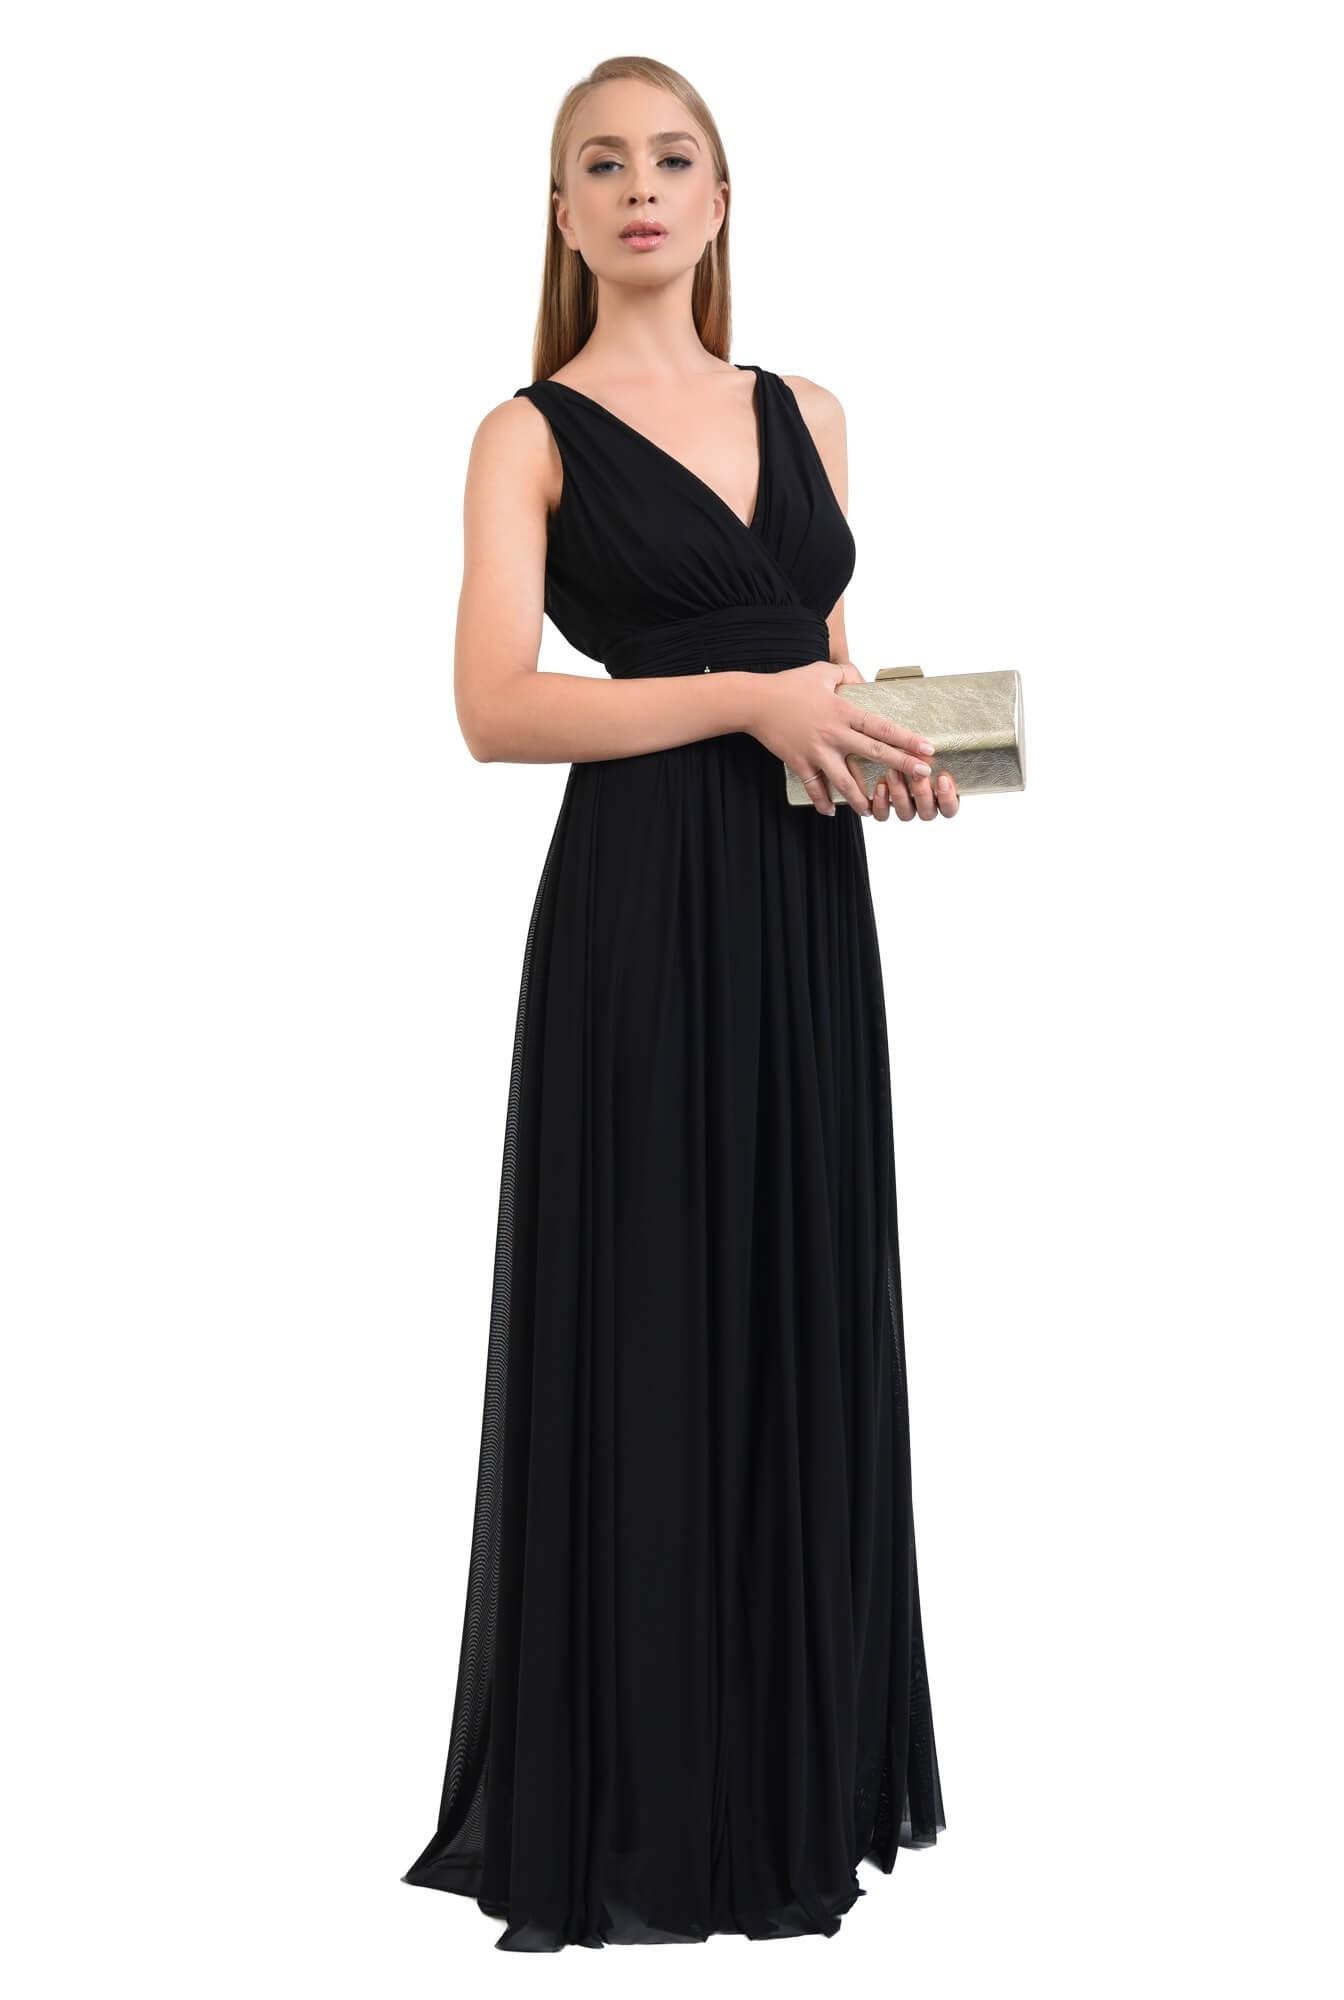 0 - rochie eleganta, lunga, tul, negru, decolteu, anchior